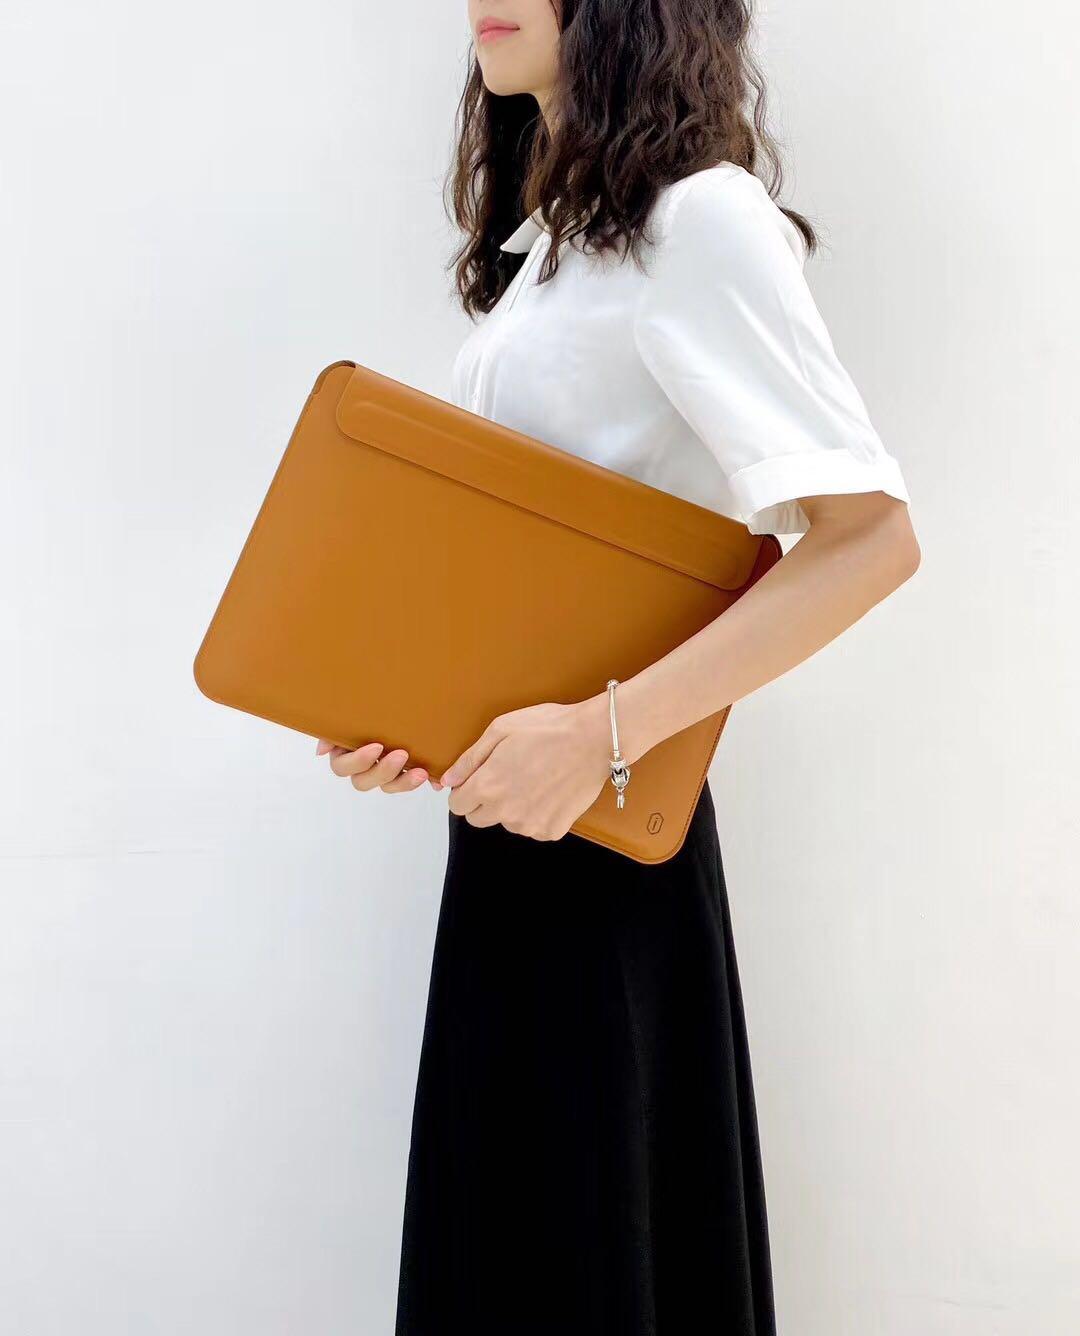 WIWU Skin Pro II PU Leather Waterproof Sleeve for MacBook [Brown]